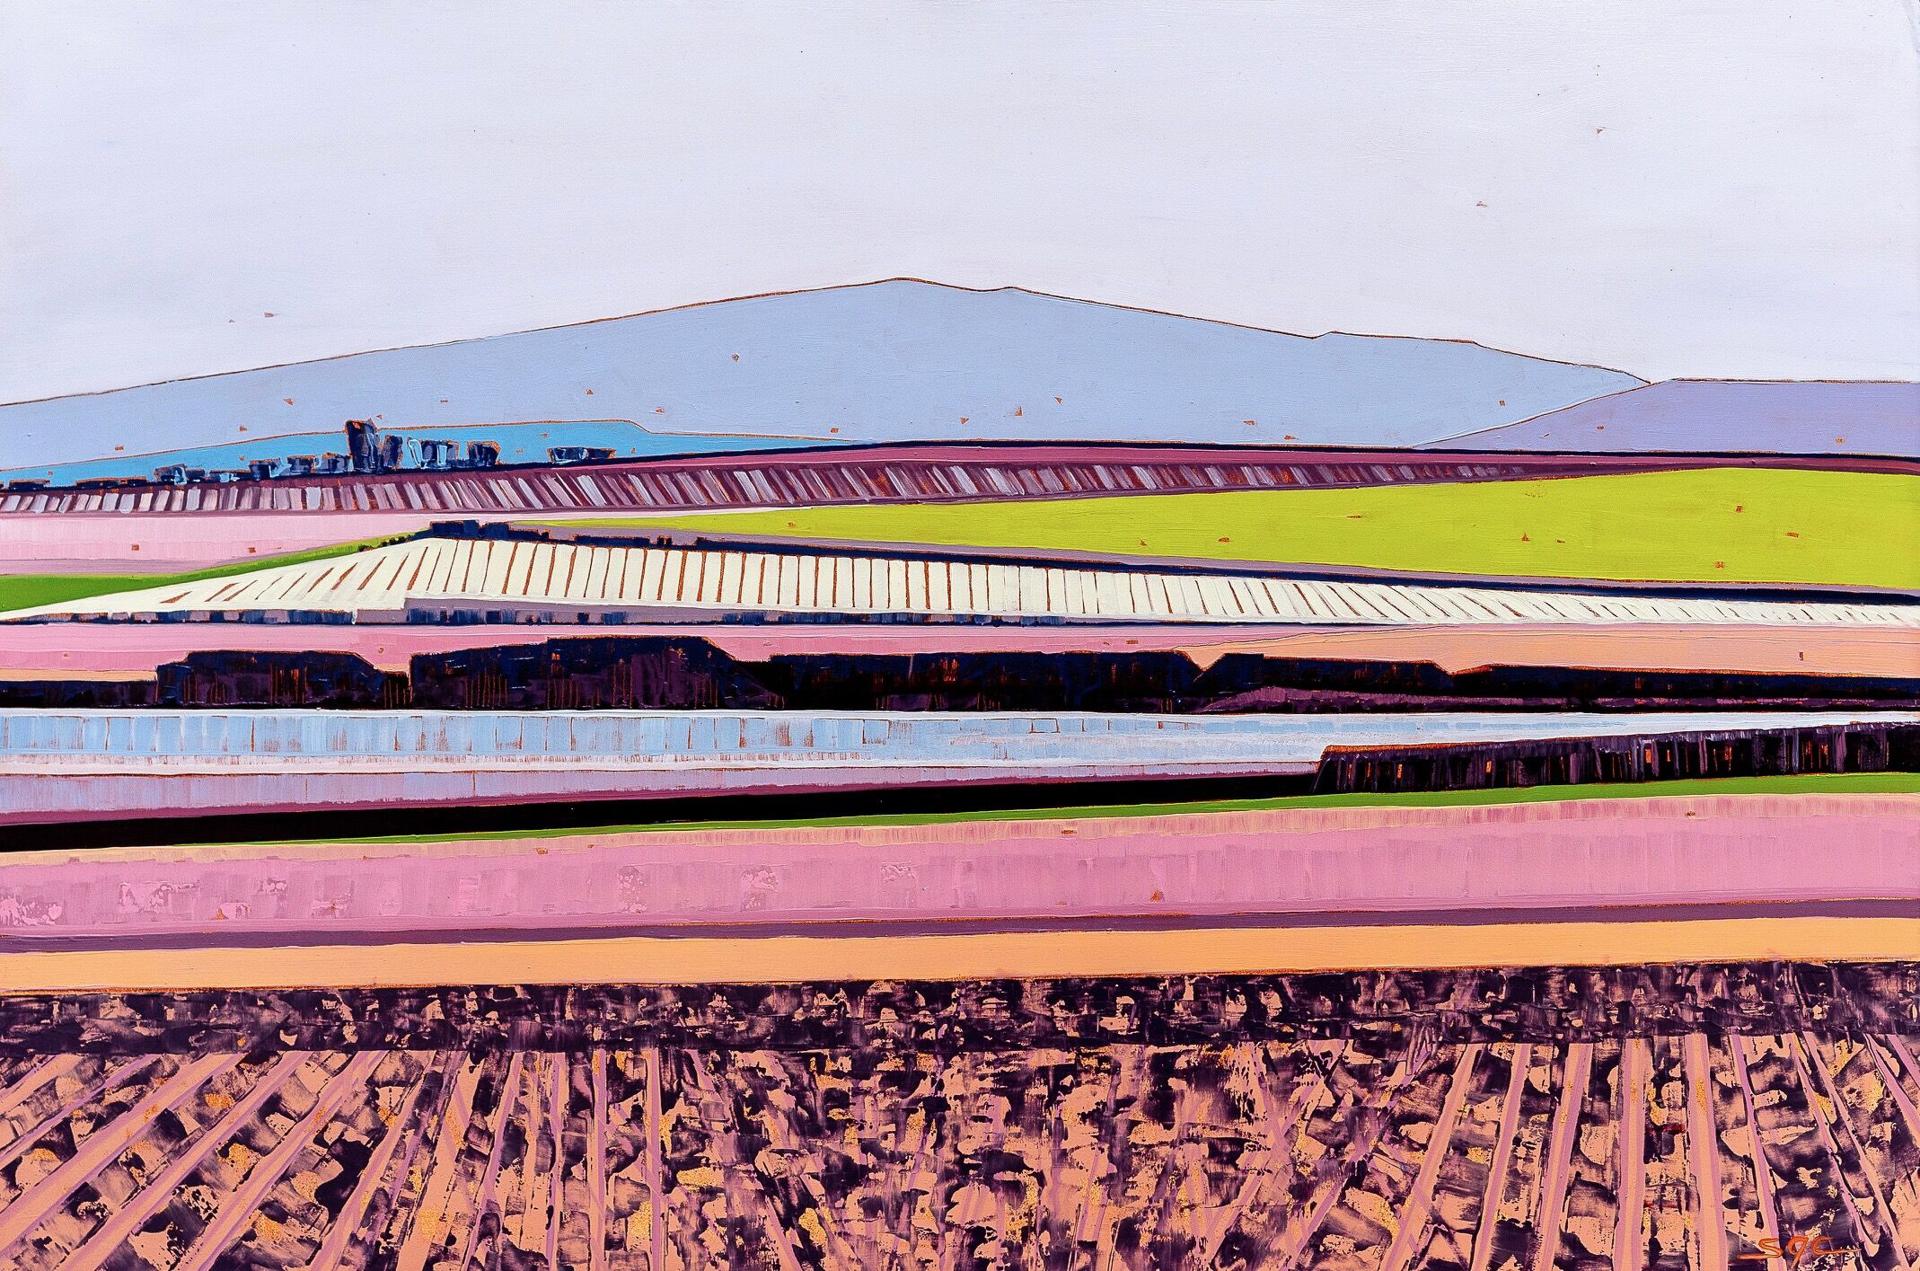 vineyard variations by Sarah Gayle Carter